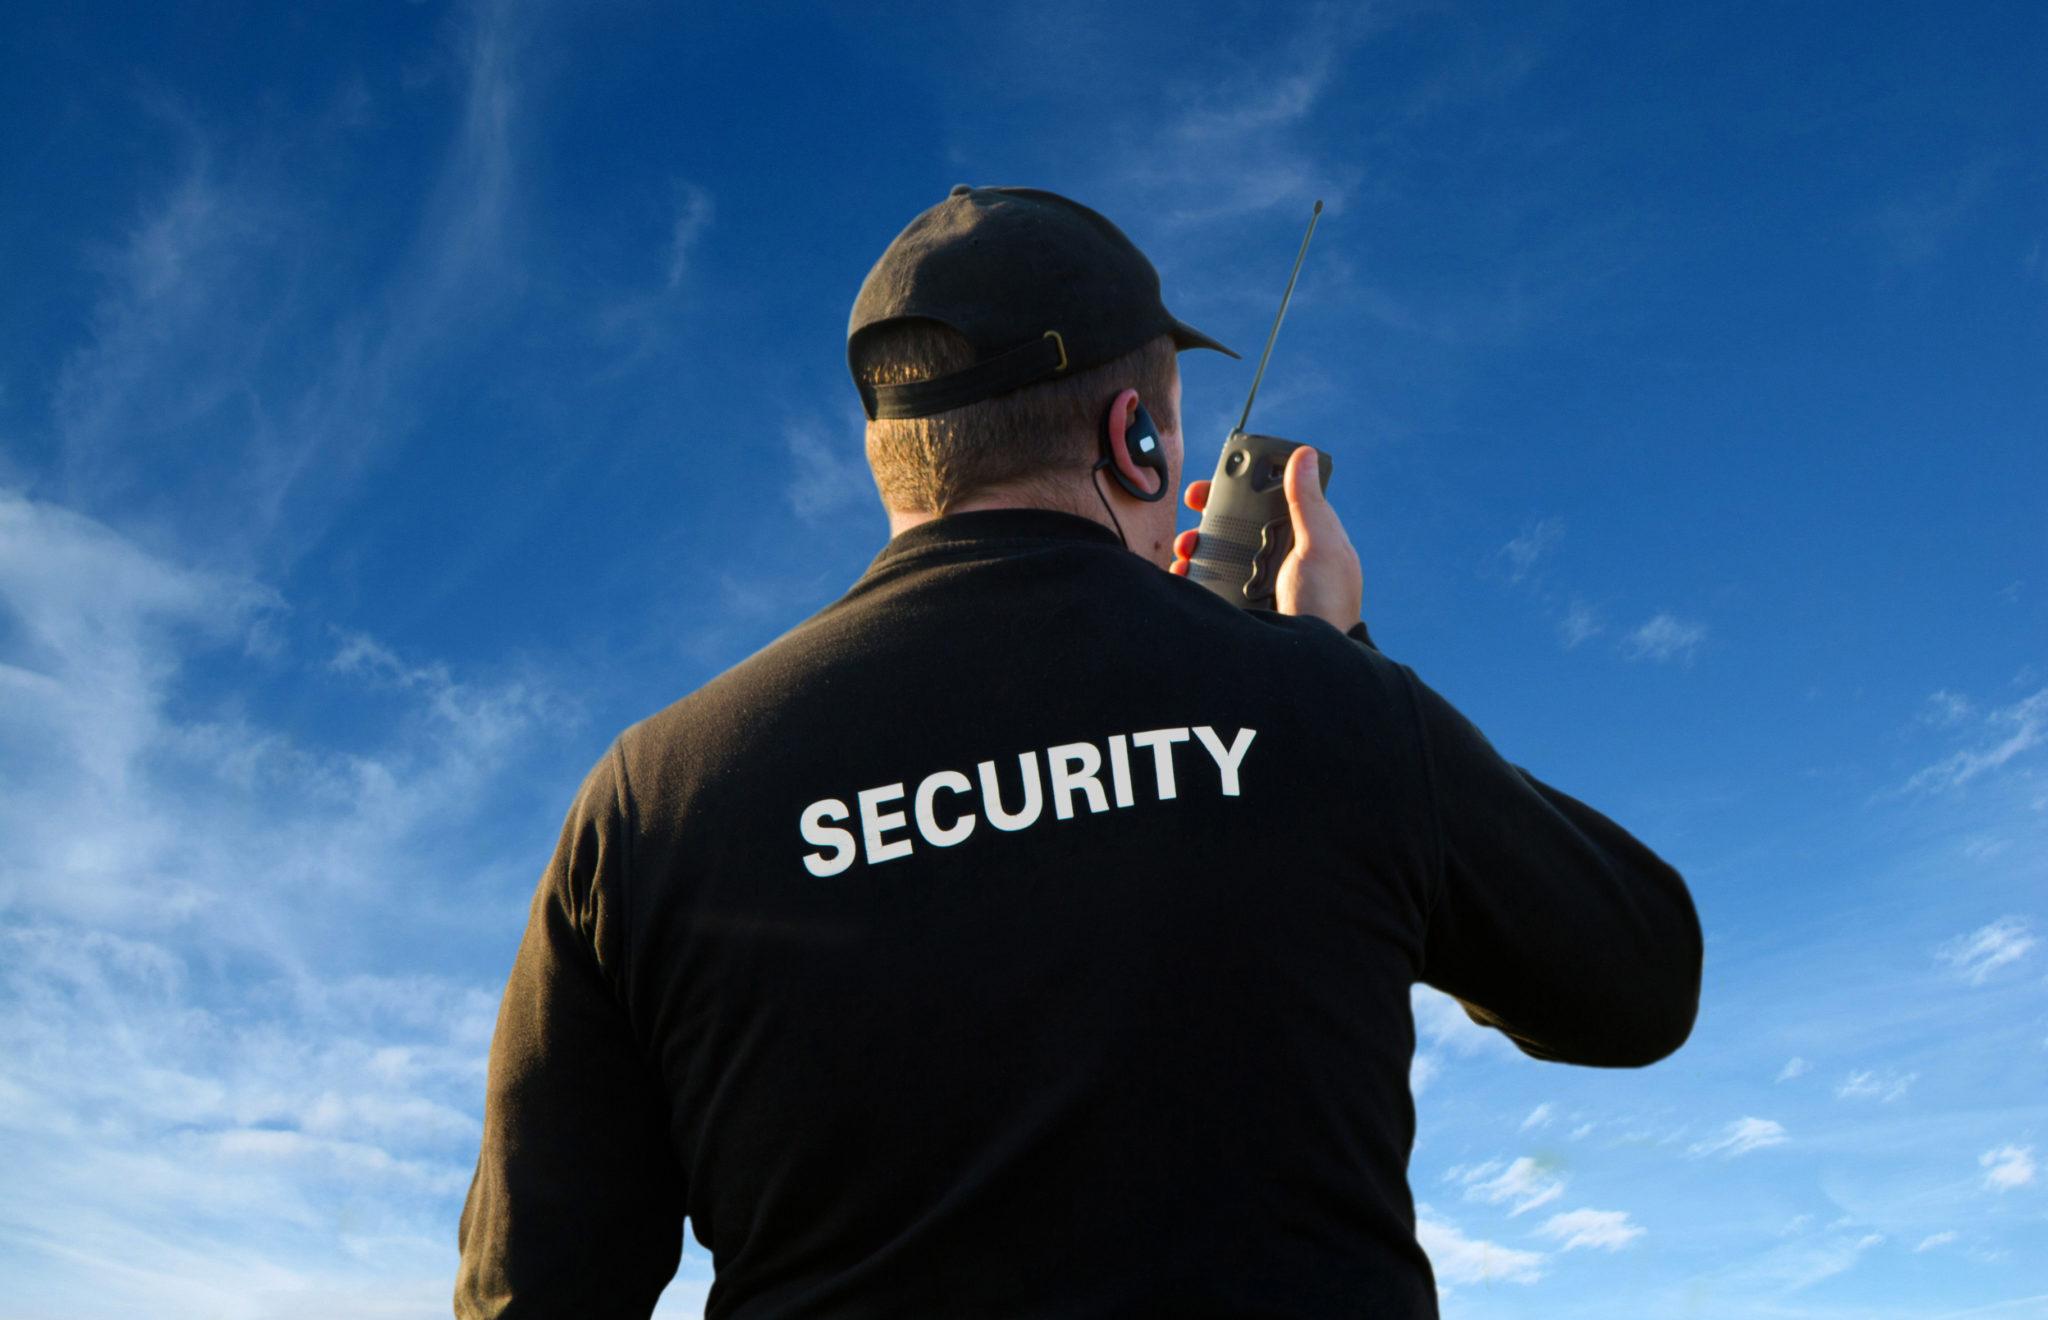 Security-Guard-large